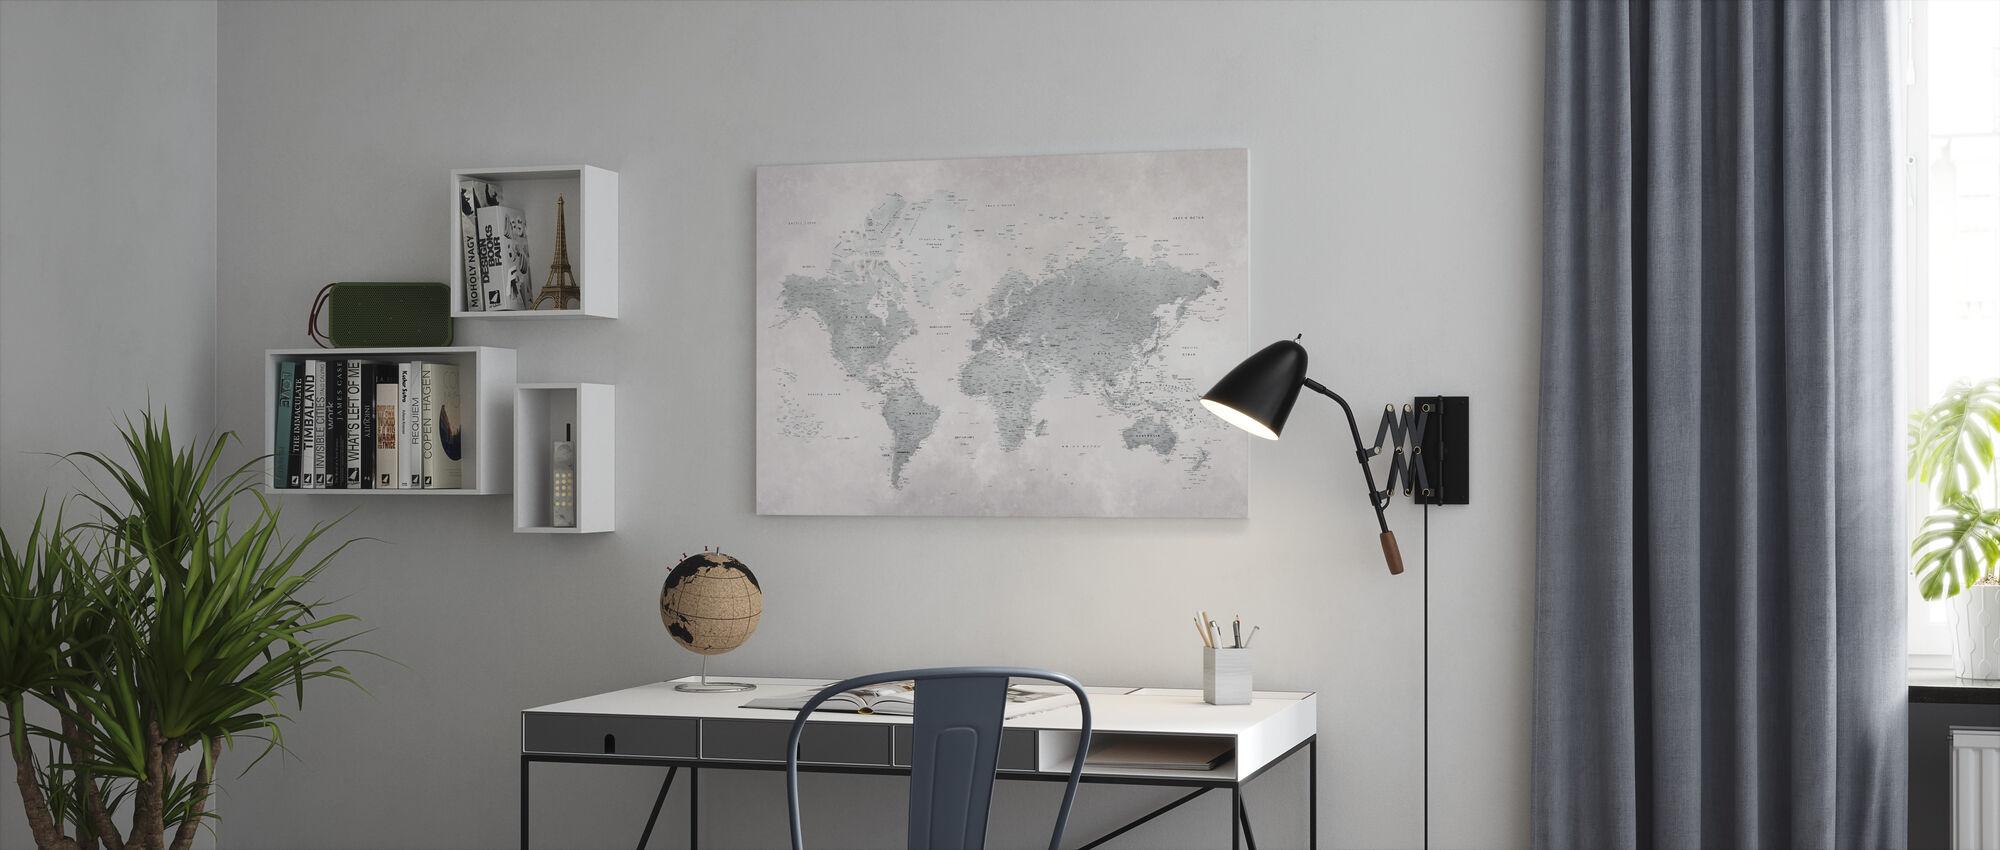 World Map - Ash-Green - Canvas print - Office